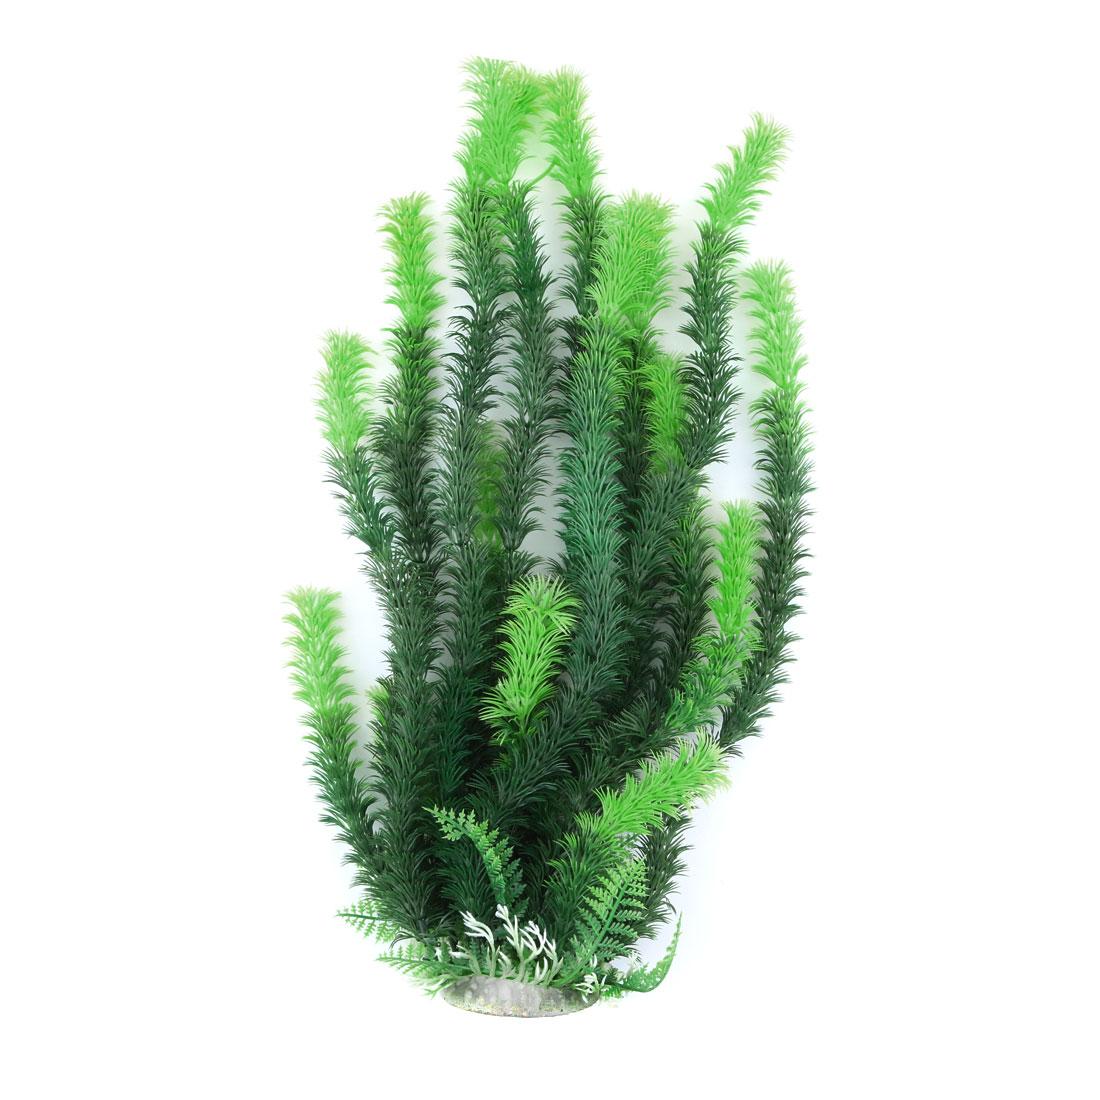 Aquarium Fish Bowl Plastic Artificial Plant Grass Decoration Green 46cm High